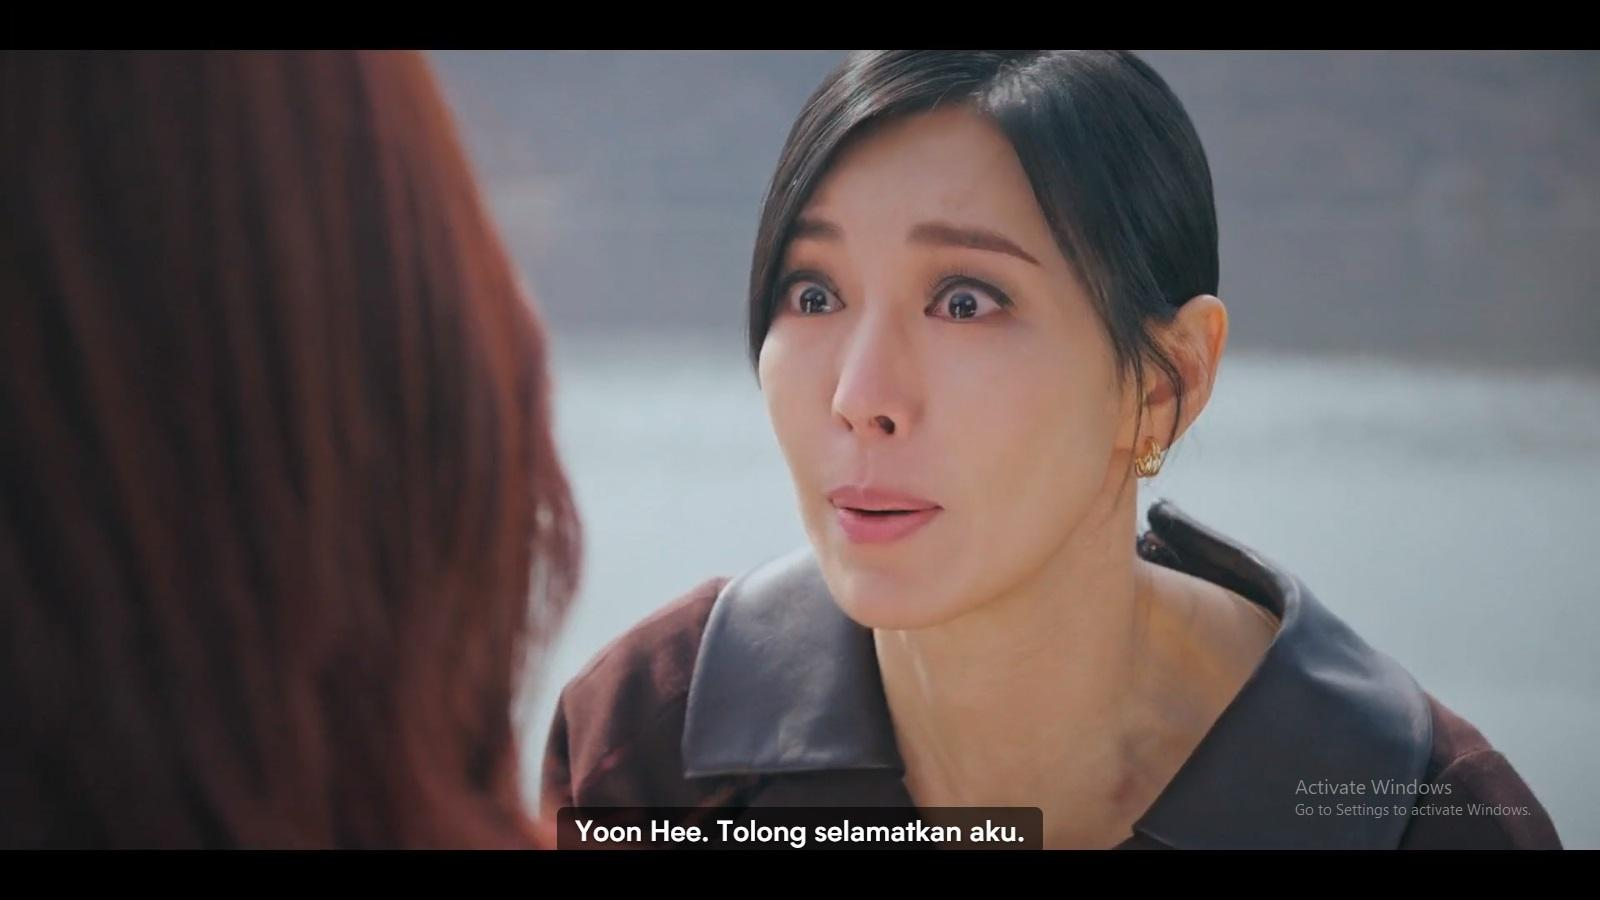 Cheon Seo Jin meminta bantuan pada Oh Yoon Hee.